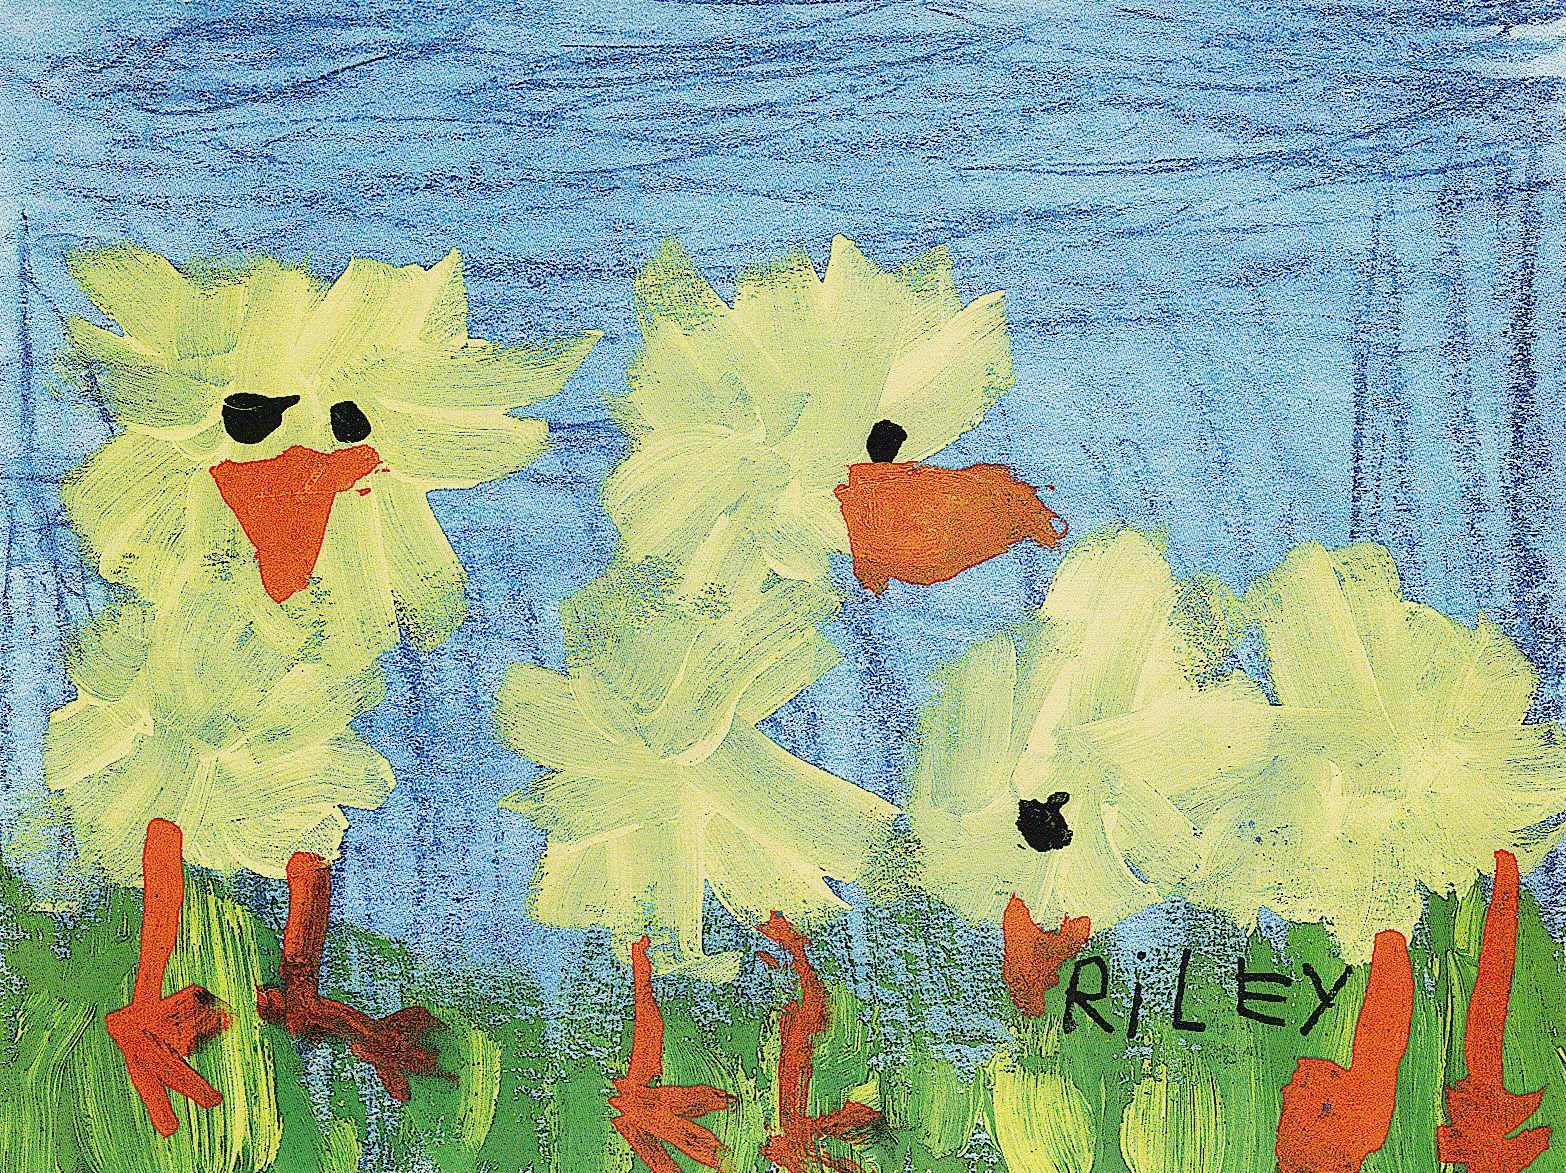 sponge paint ducks preschool art ideas in 2019. Black Bedroom Furniture Sets. Home Design Ideas